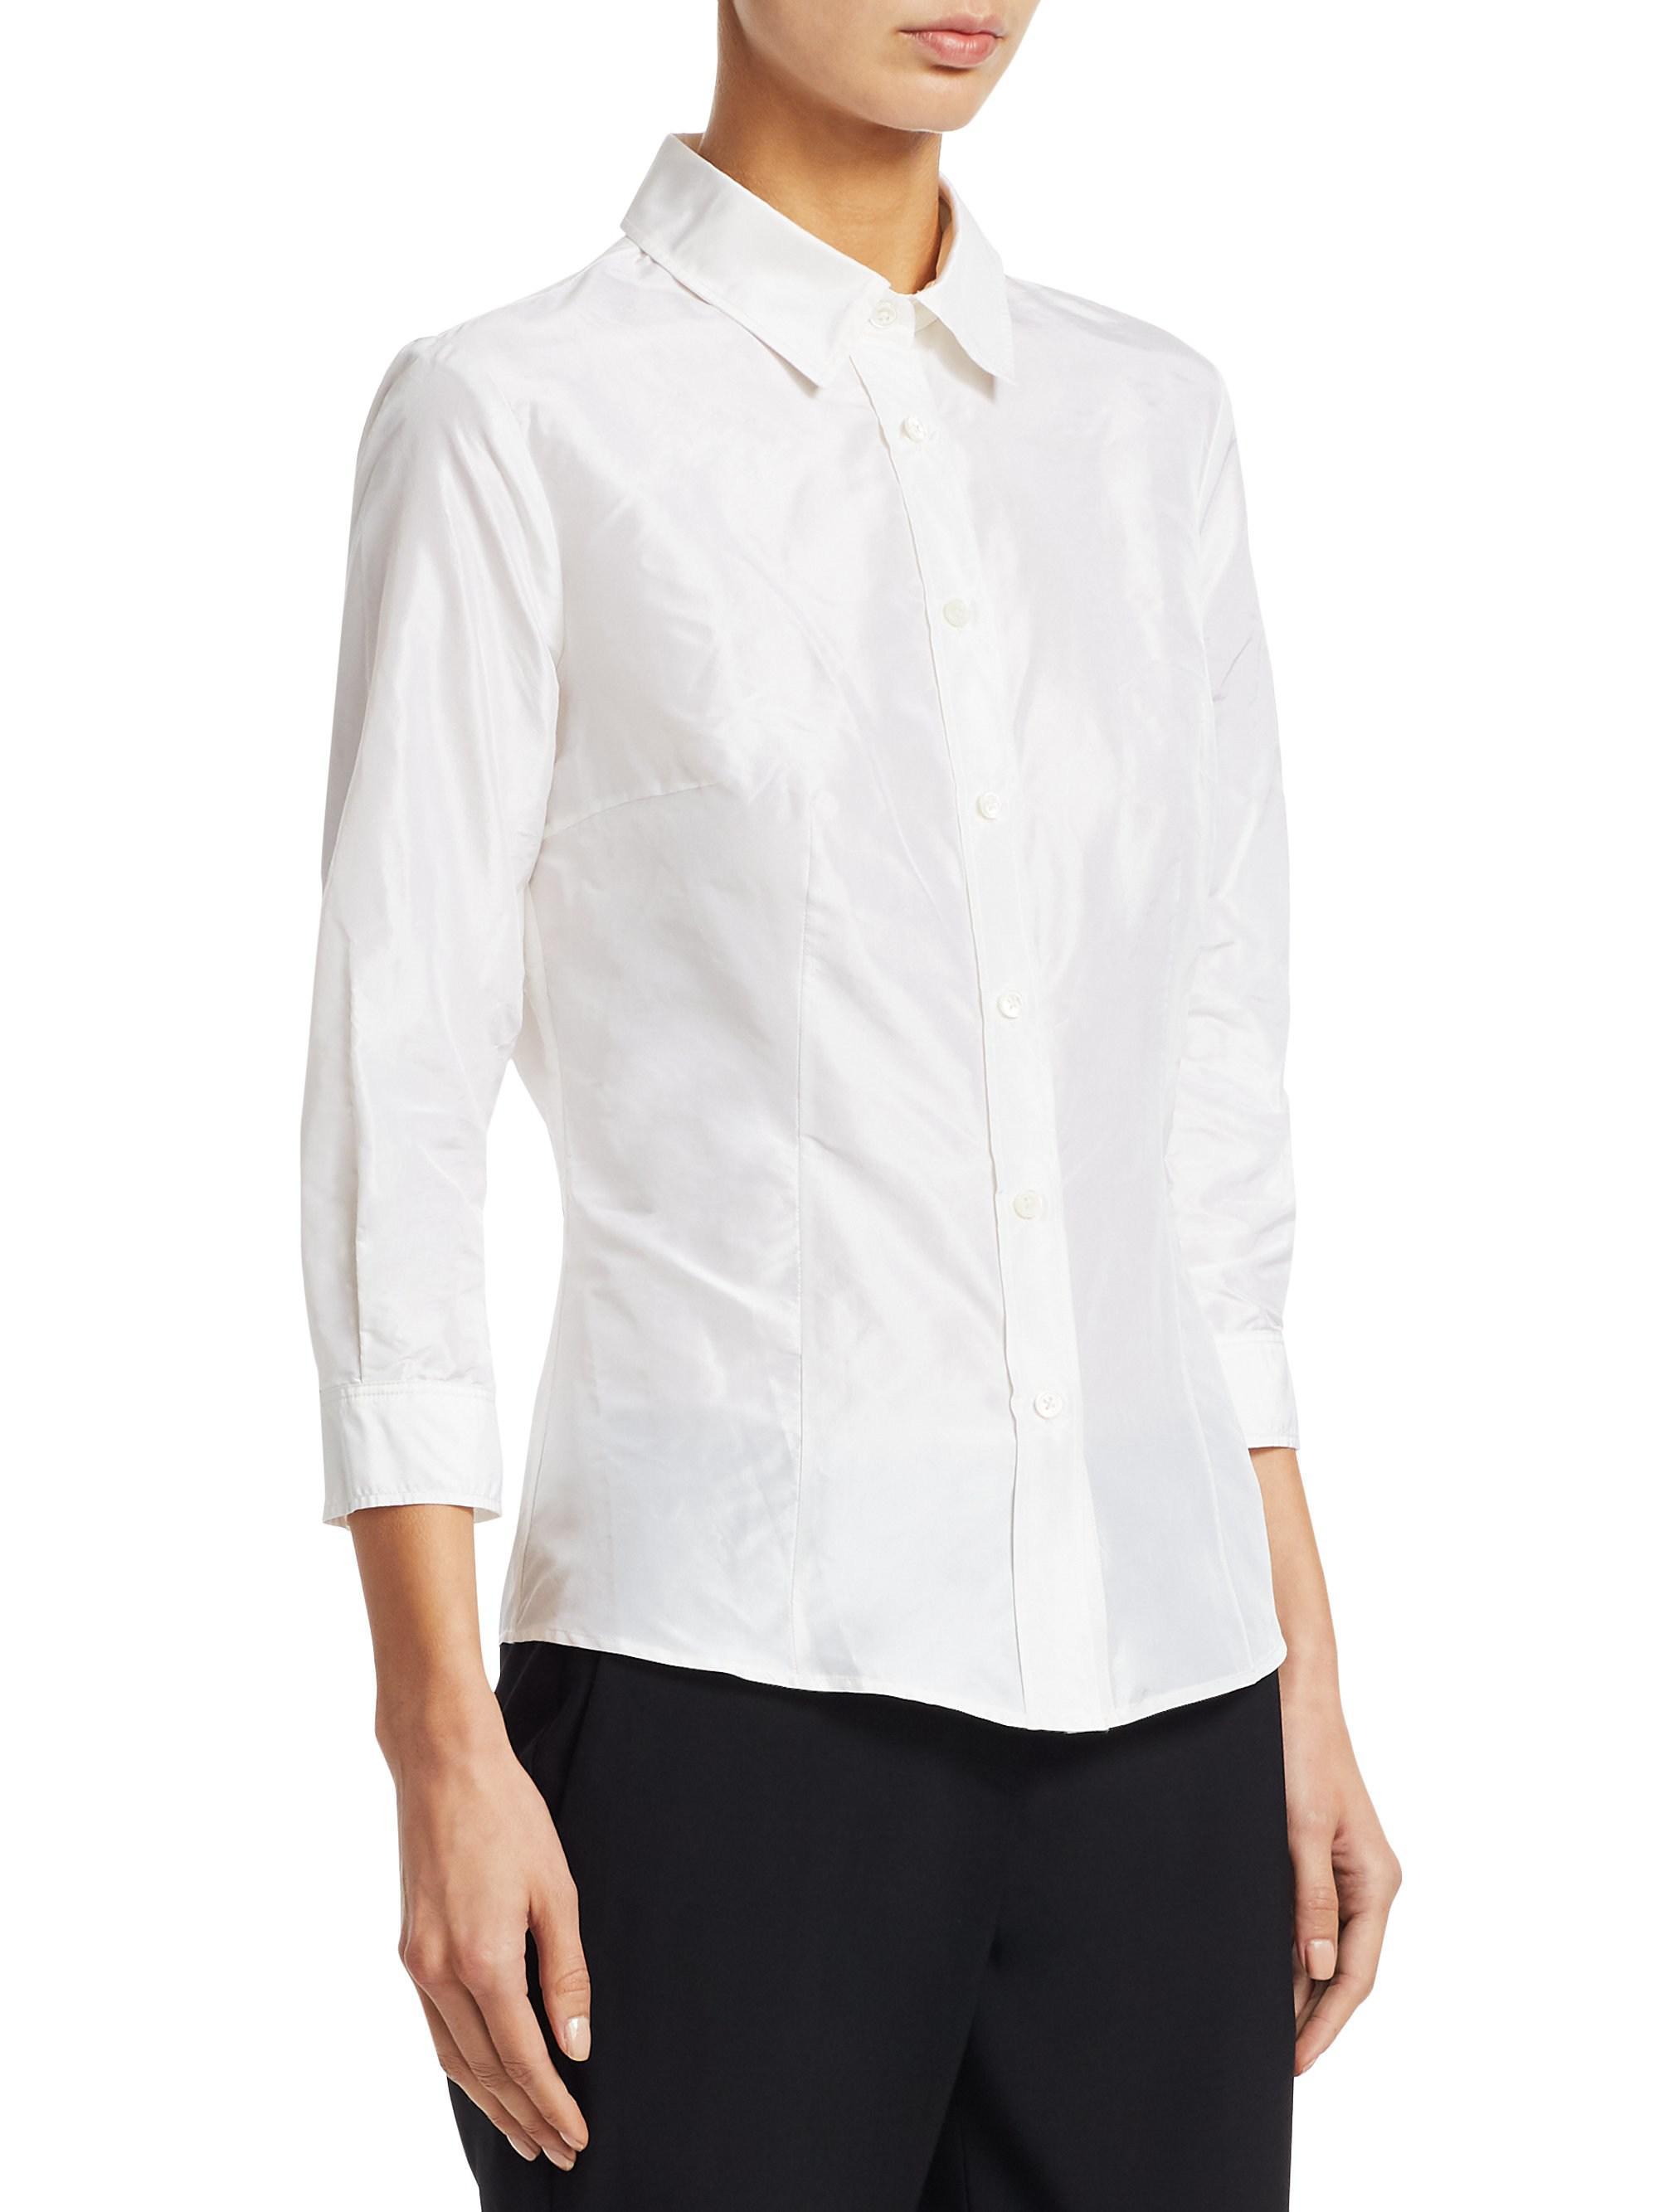 2dd842de5698c Carolina Herrera Signature Taffeta Blouse in White - Lyst